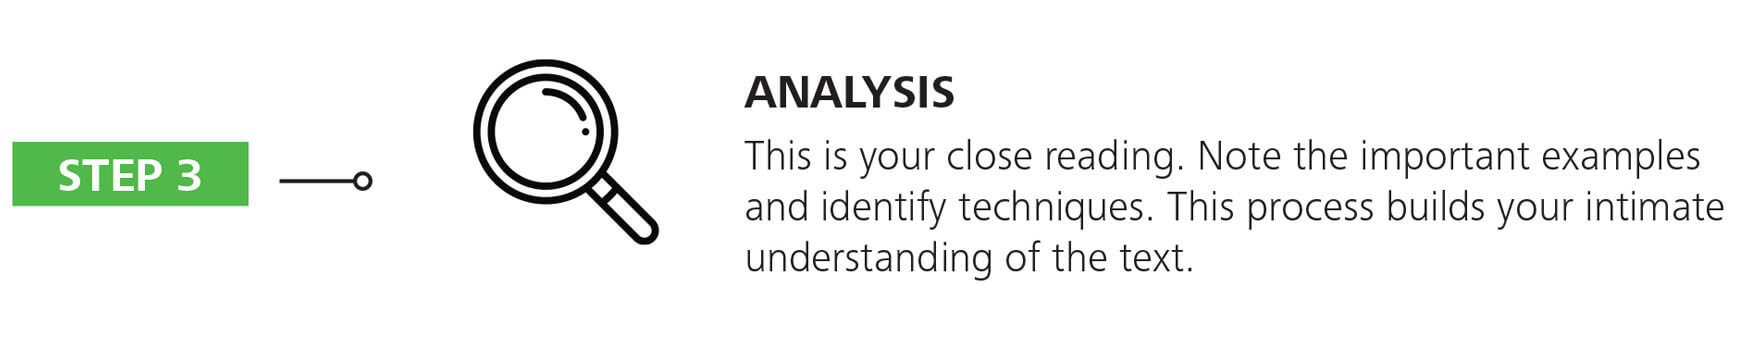 english-guide-year-9-how-to-analyse-shakespeare-the-basics-matrix-method-3-analysis